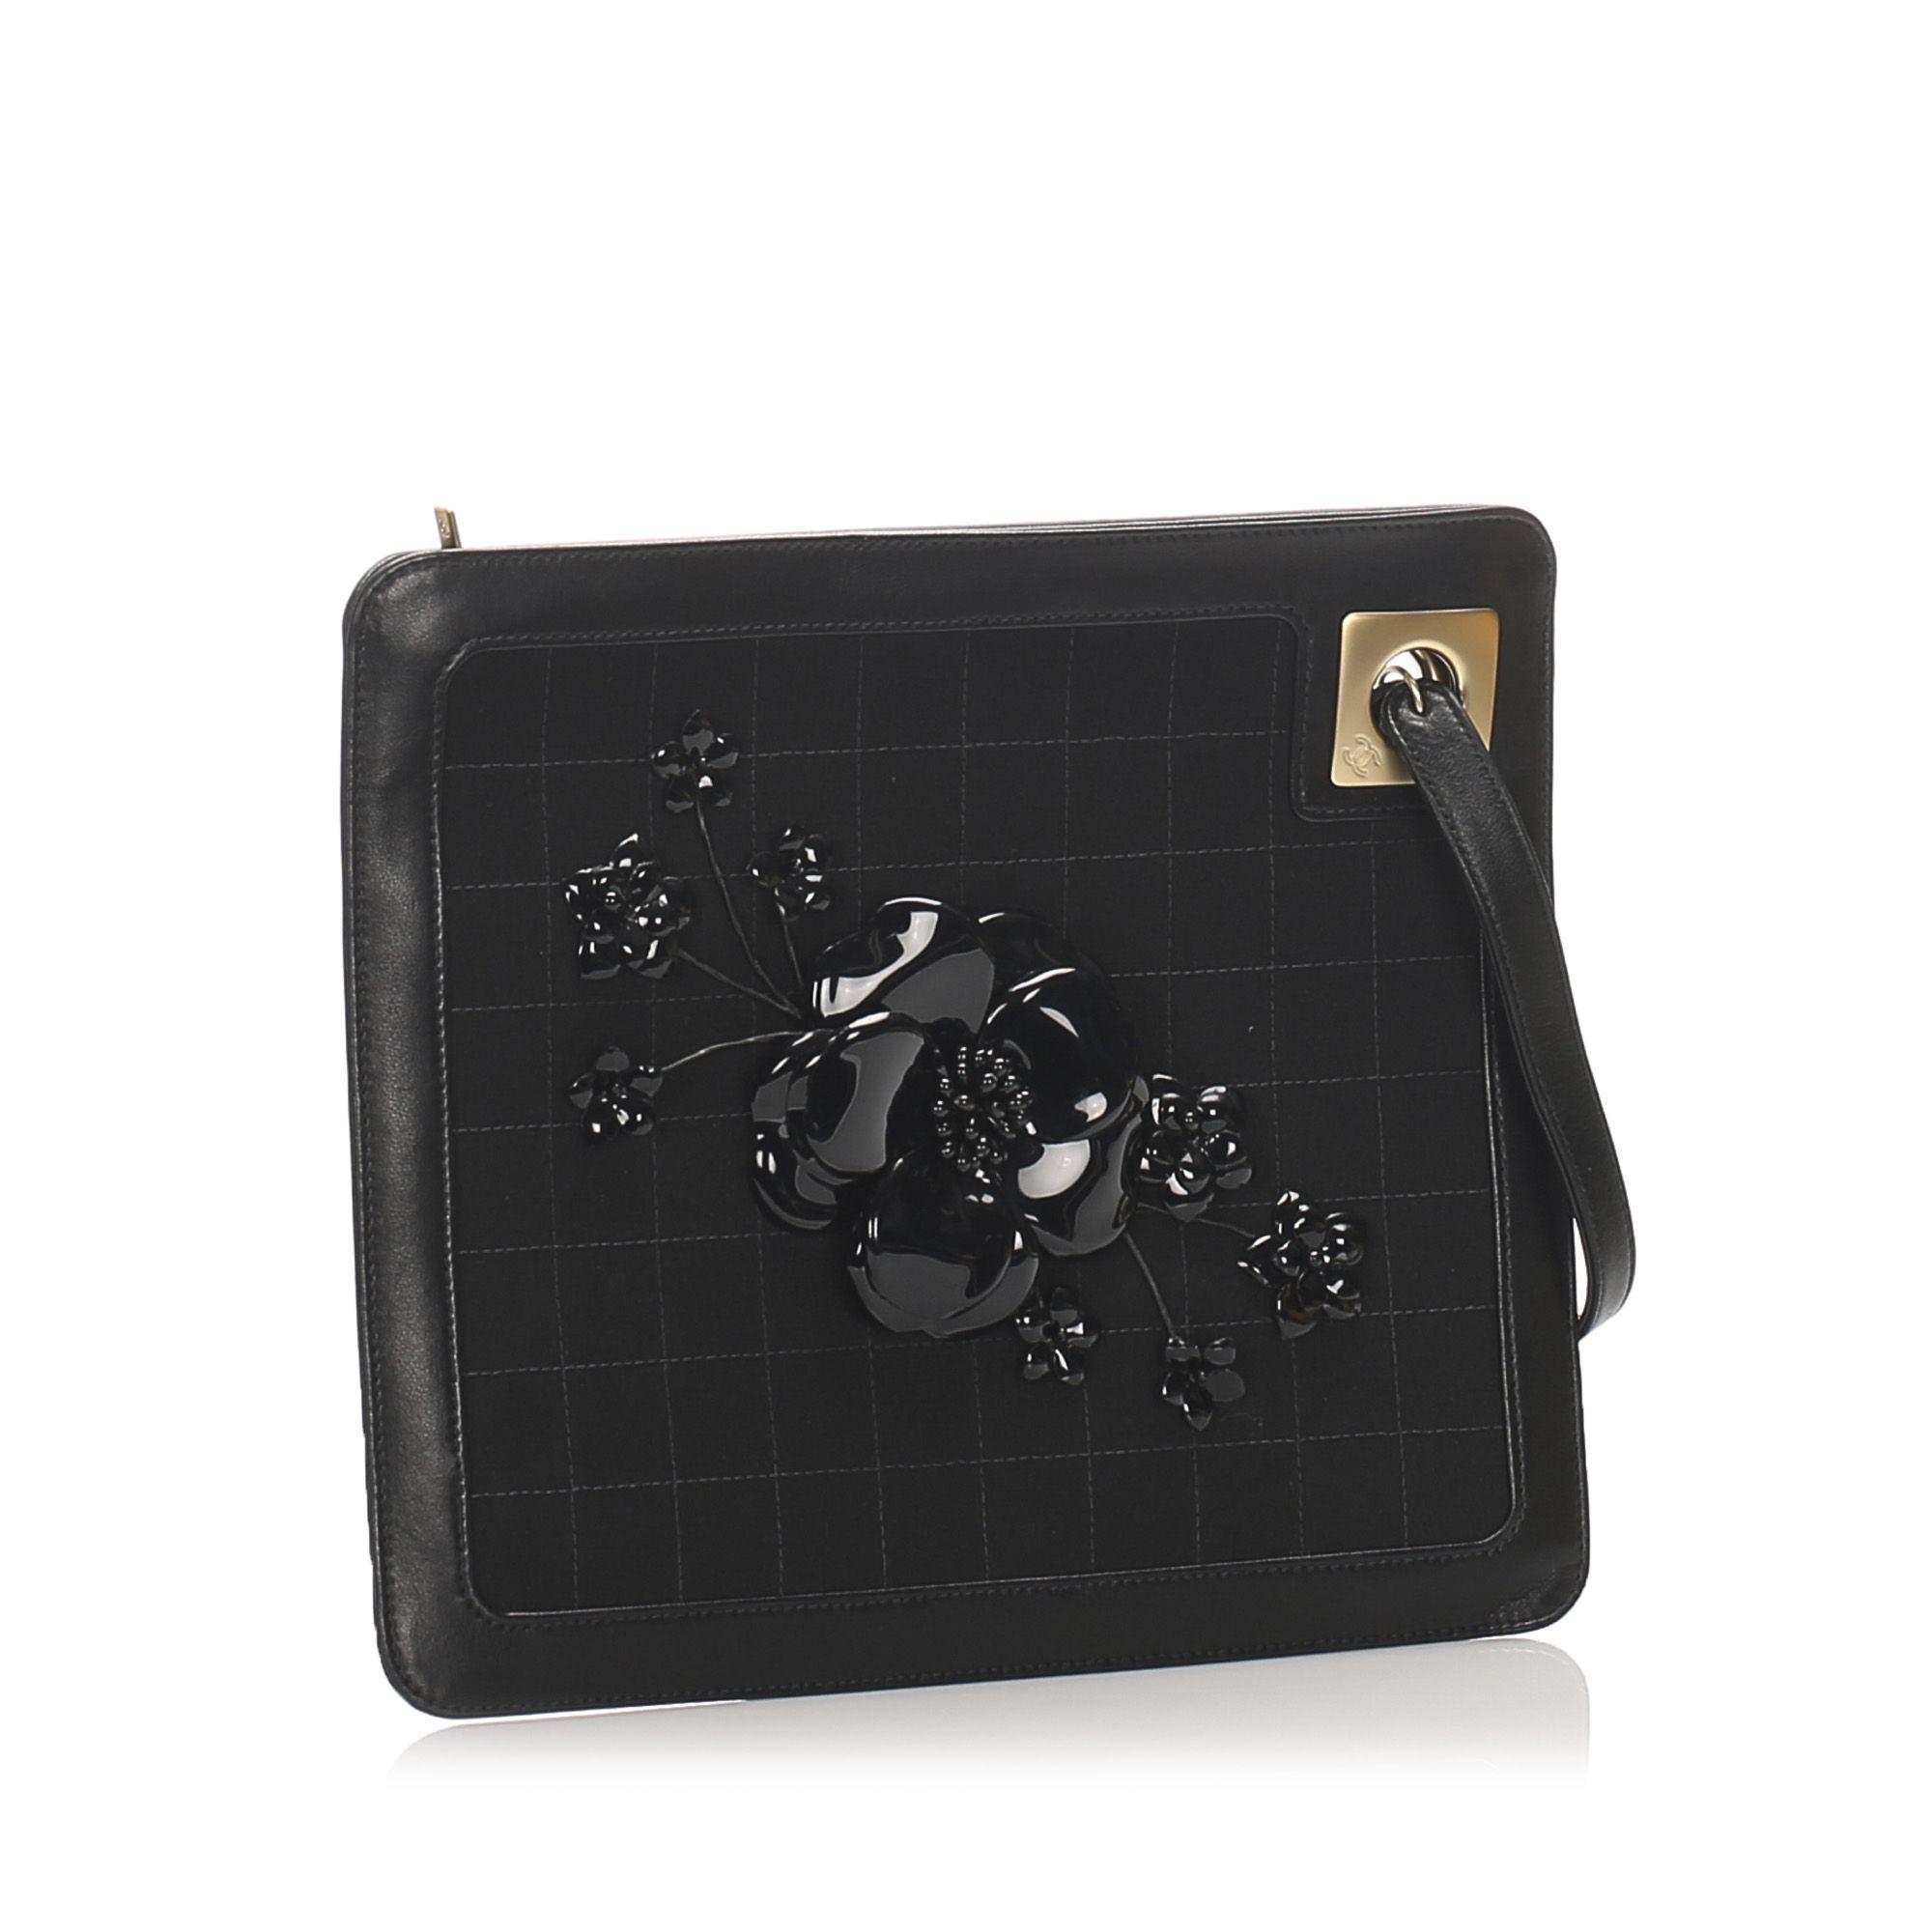 Vintage Chanel Choco Bar Camellia Suede Clutch Bag Black